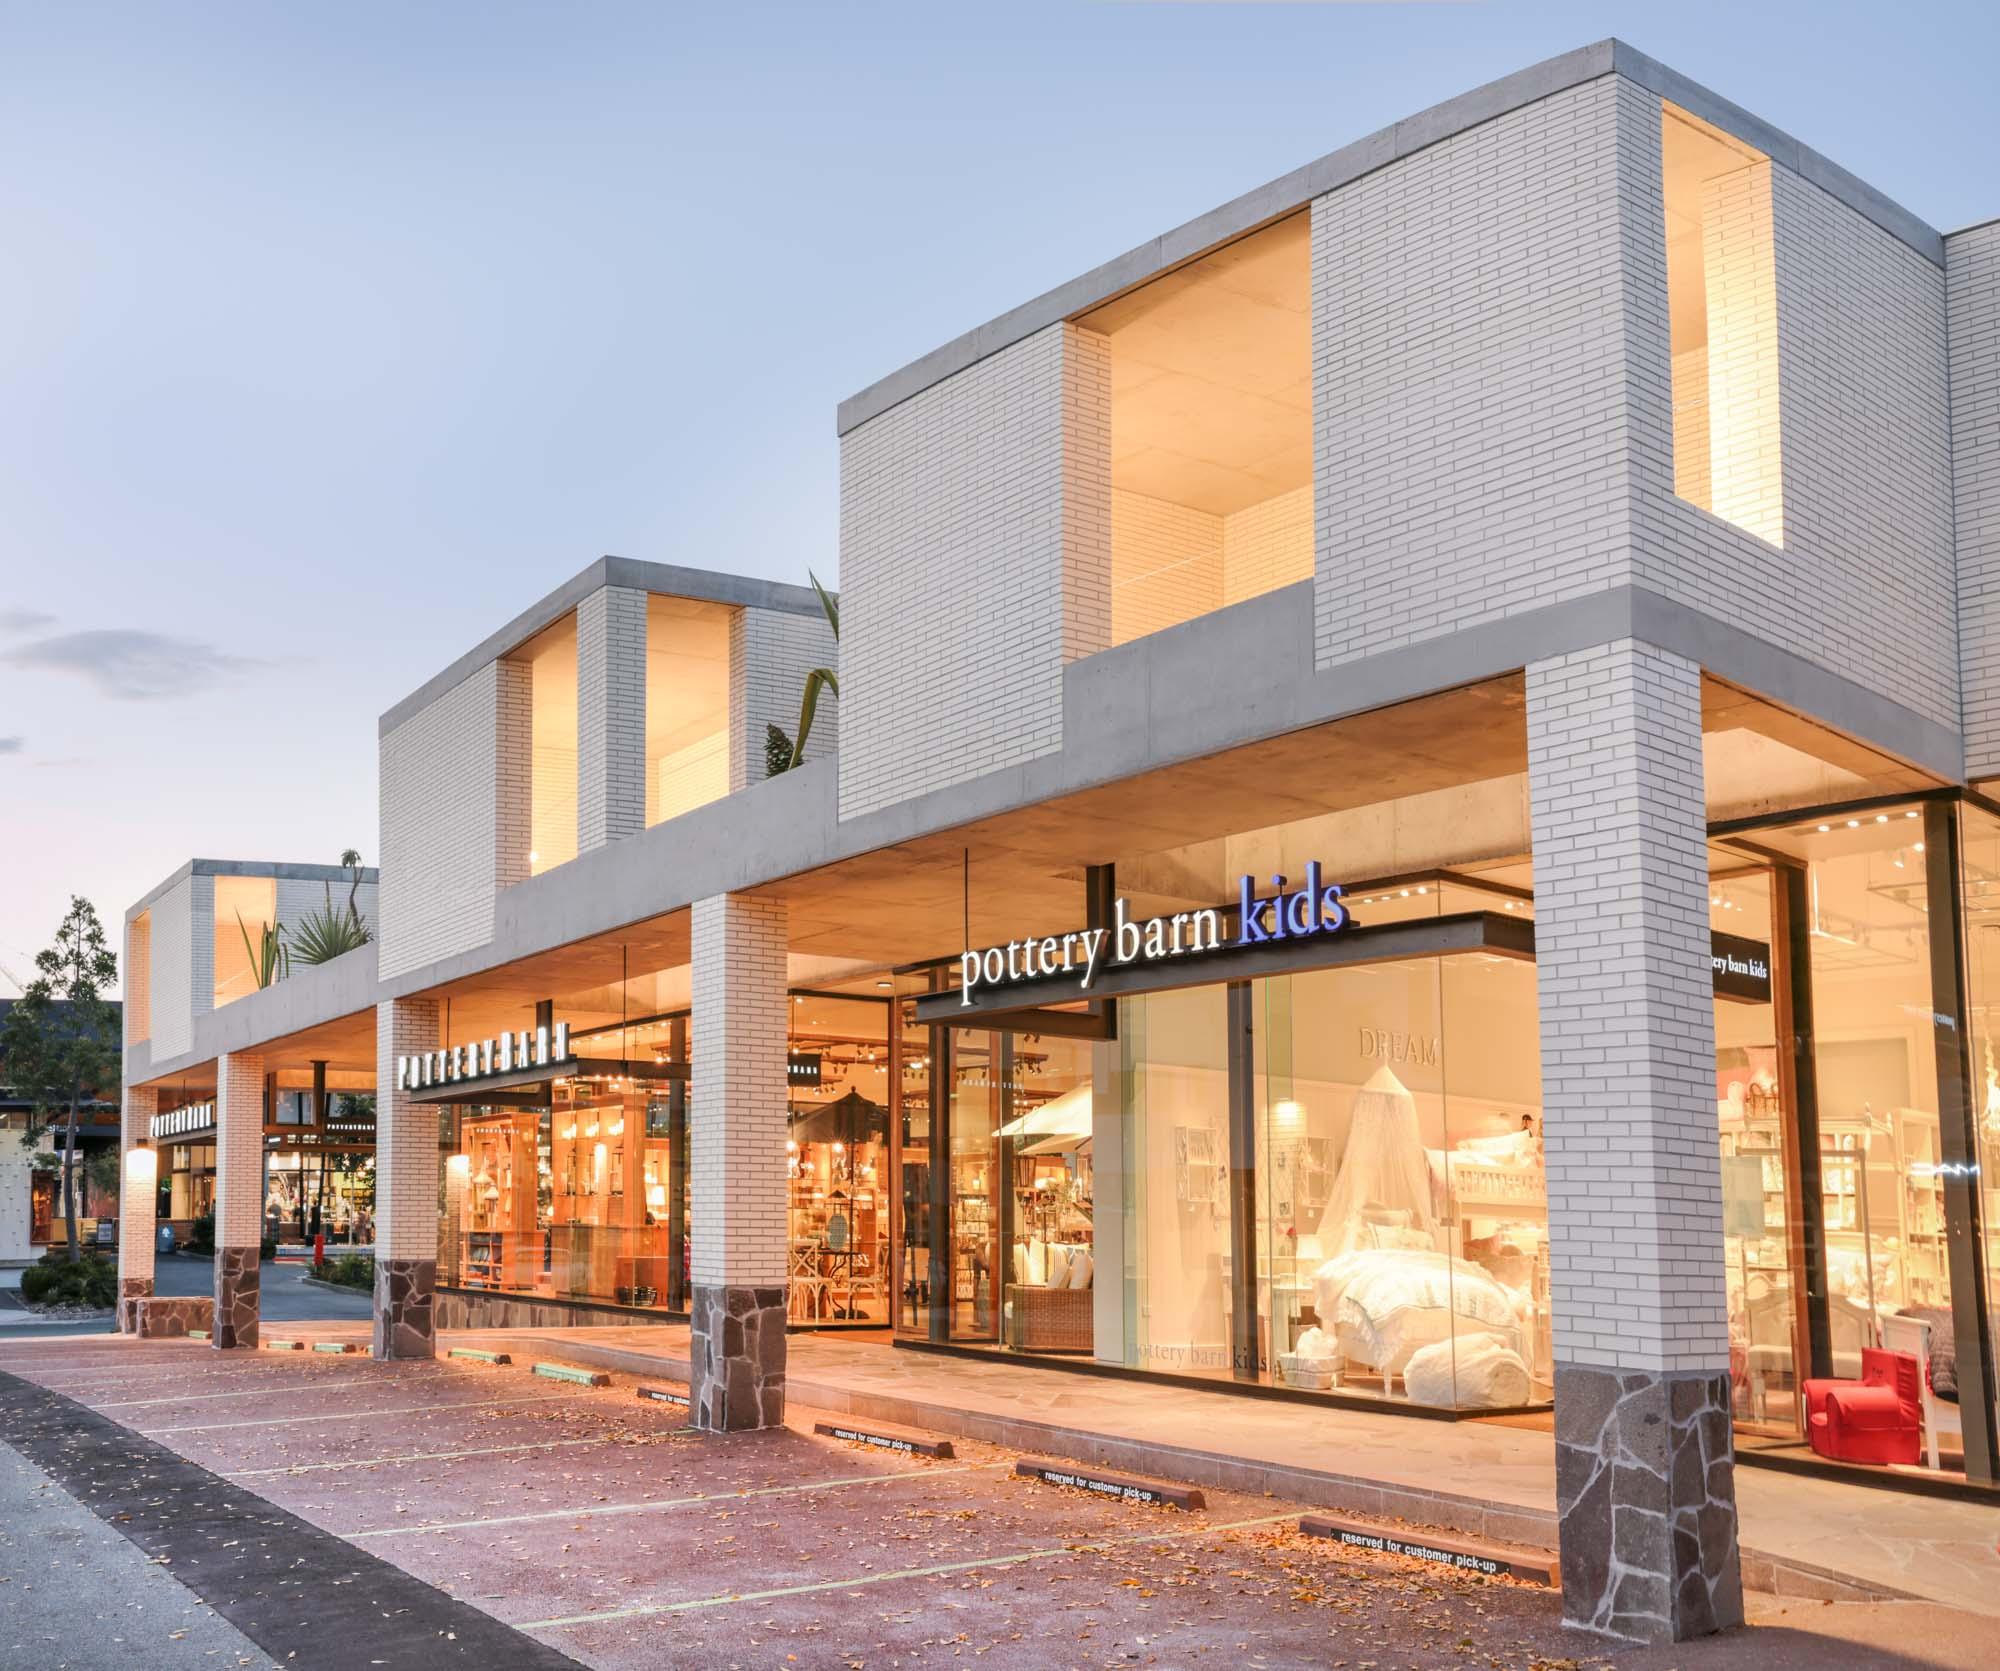 james street-retail-redevelopment (3)